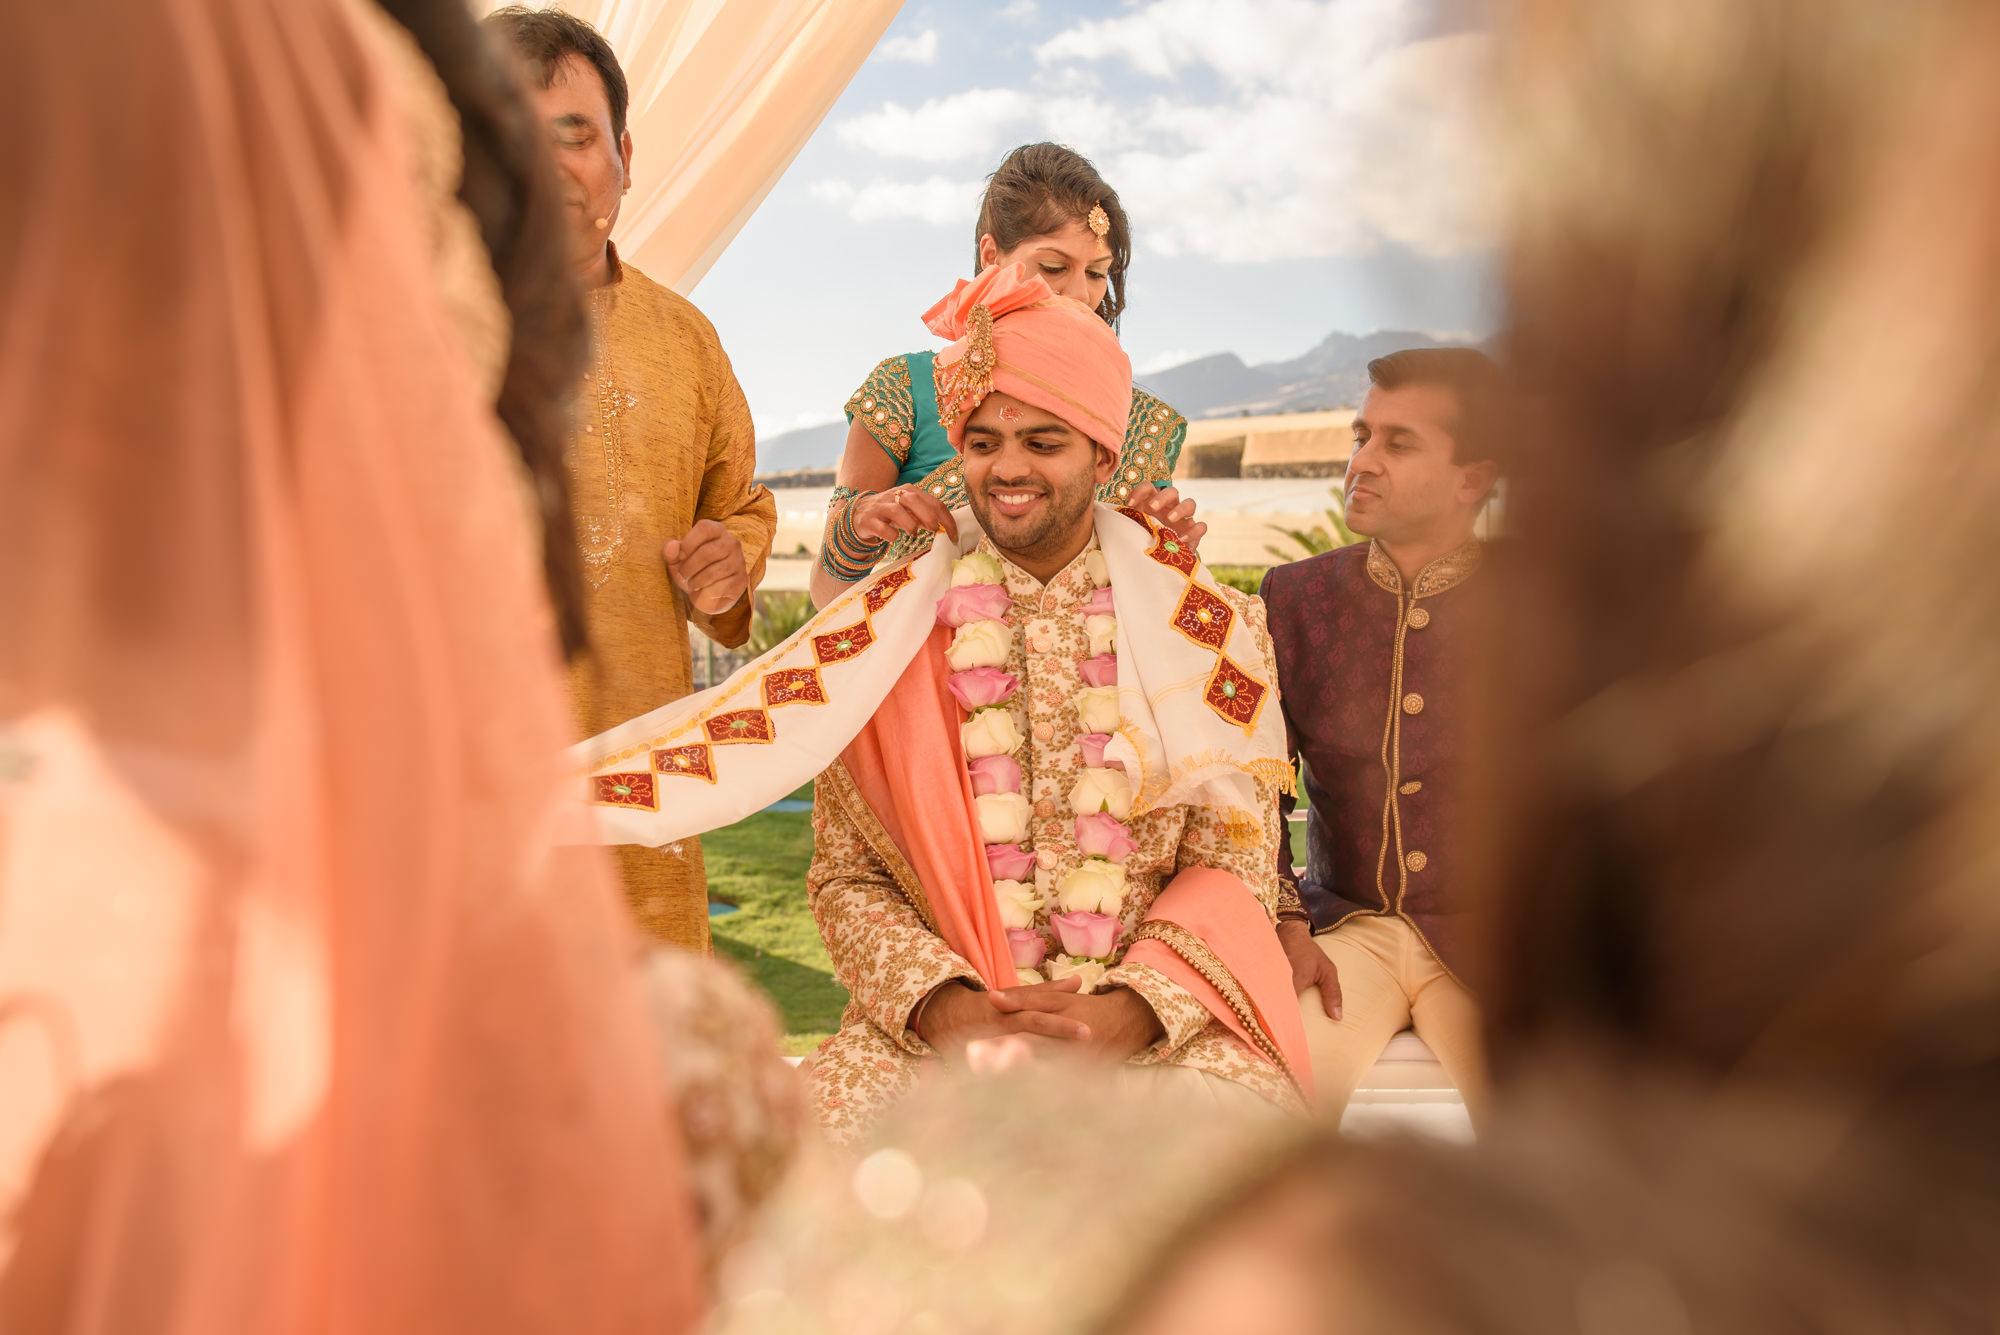 satnam photography wedding indian asian hindu destination wedding photographer tenerife ritz carlton abama-154.jpg